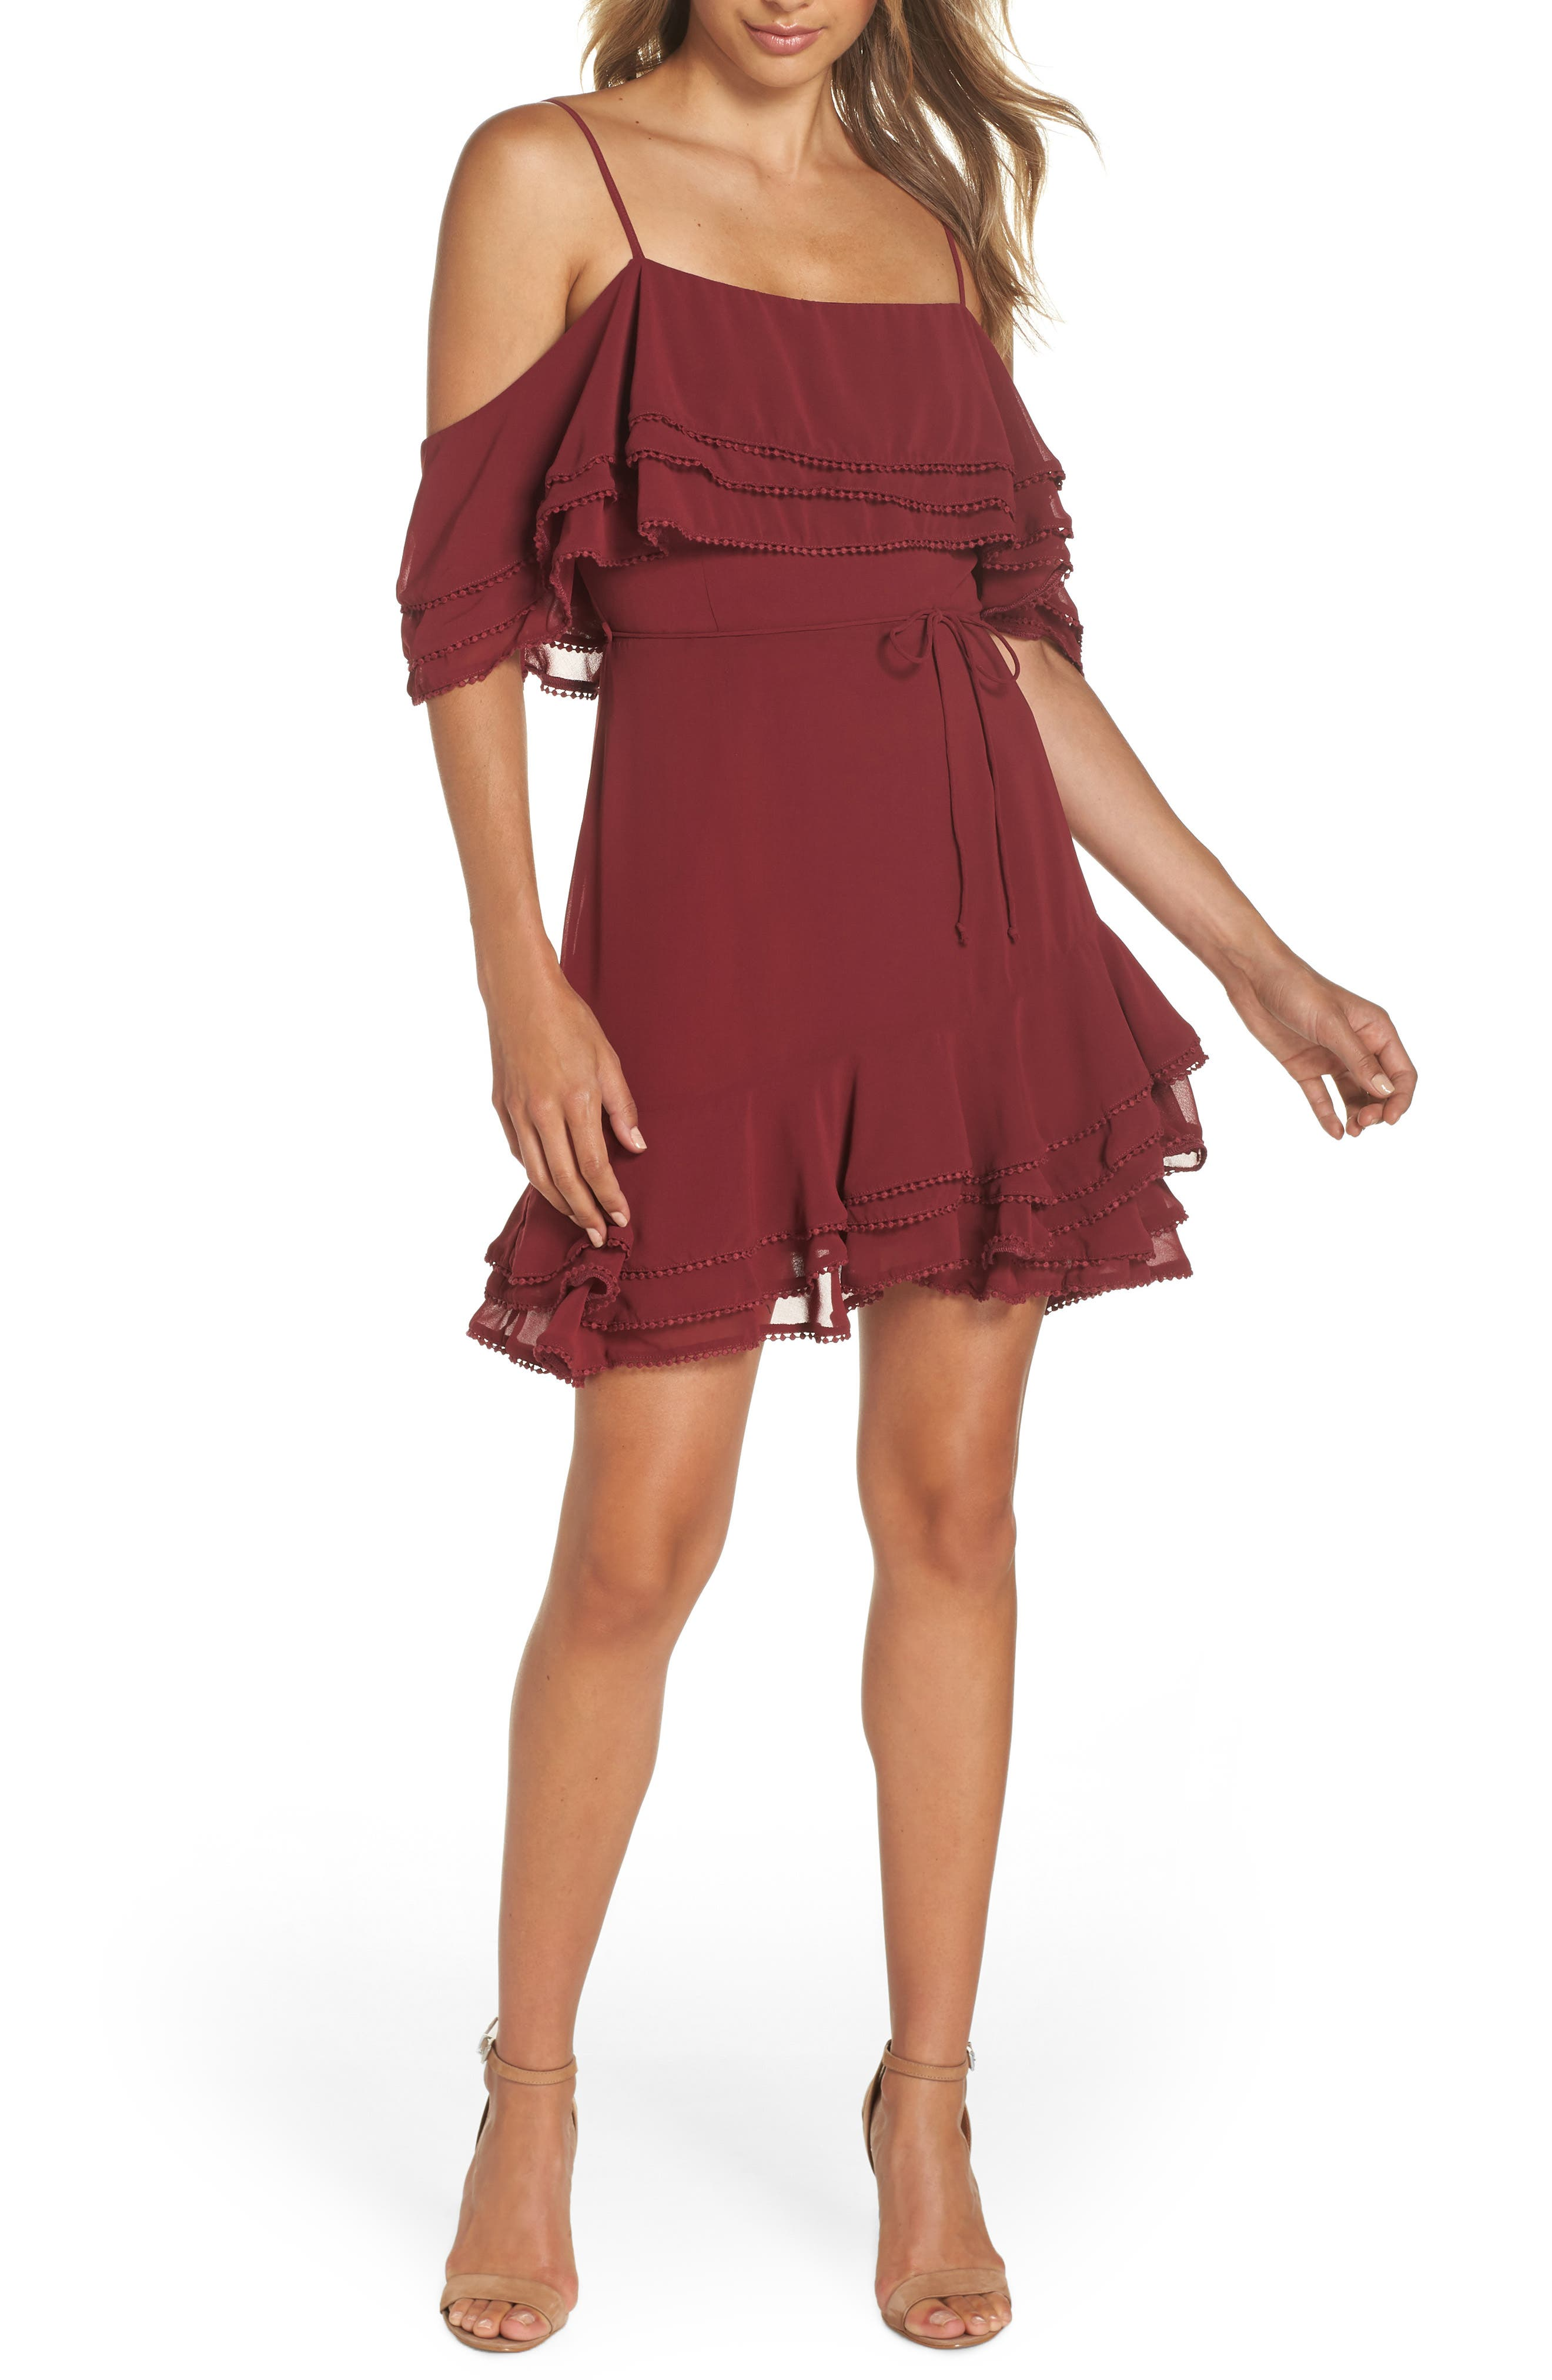 Bb Dakota Up All Night Layered Cold Shoulder Dress, Burgundy